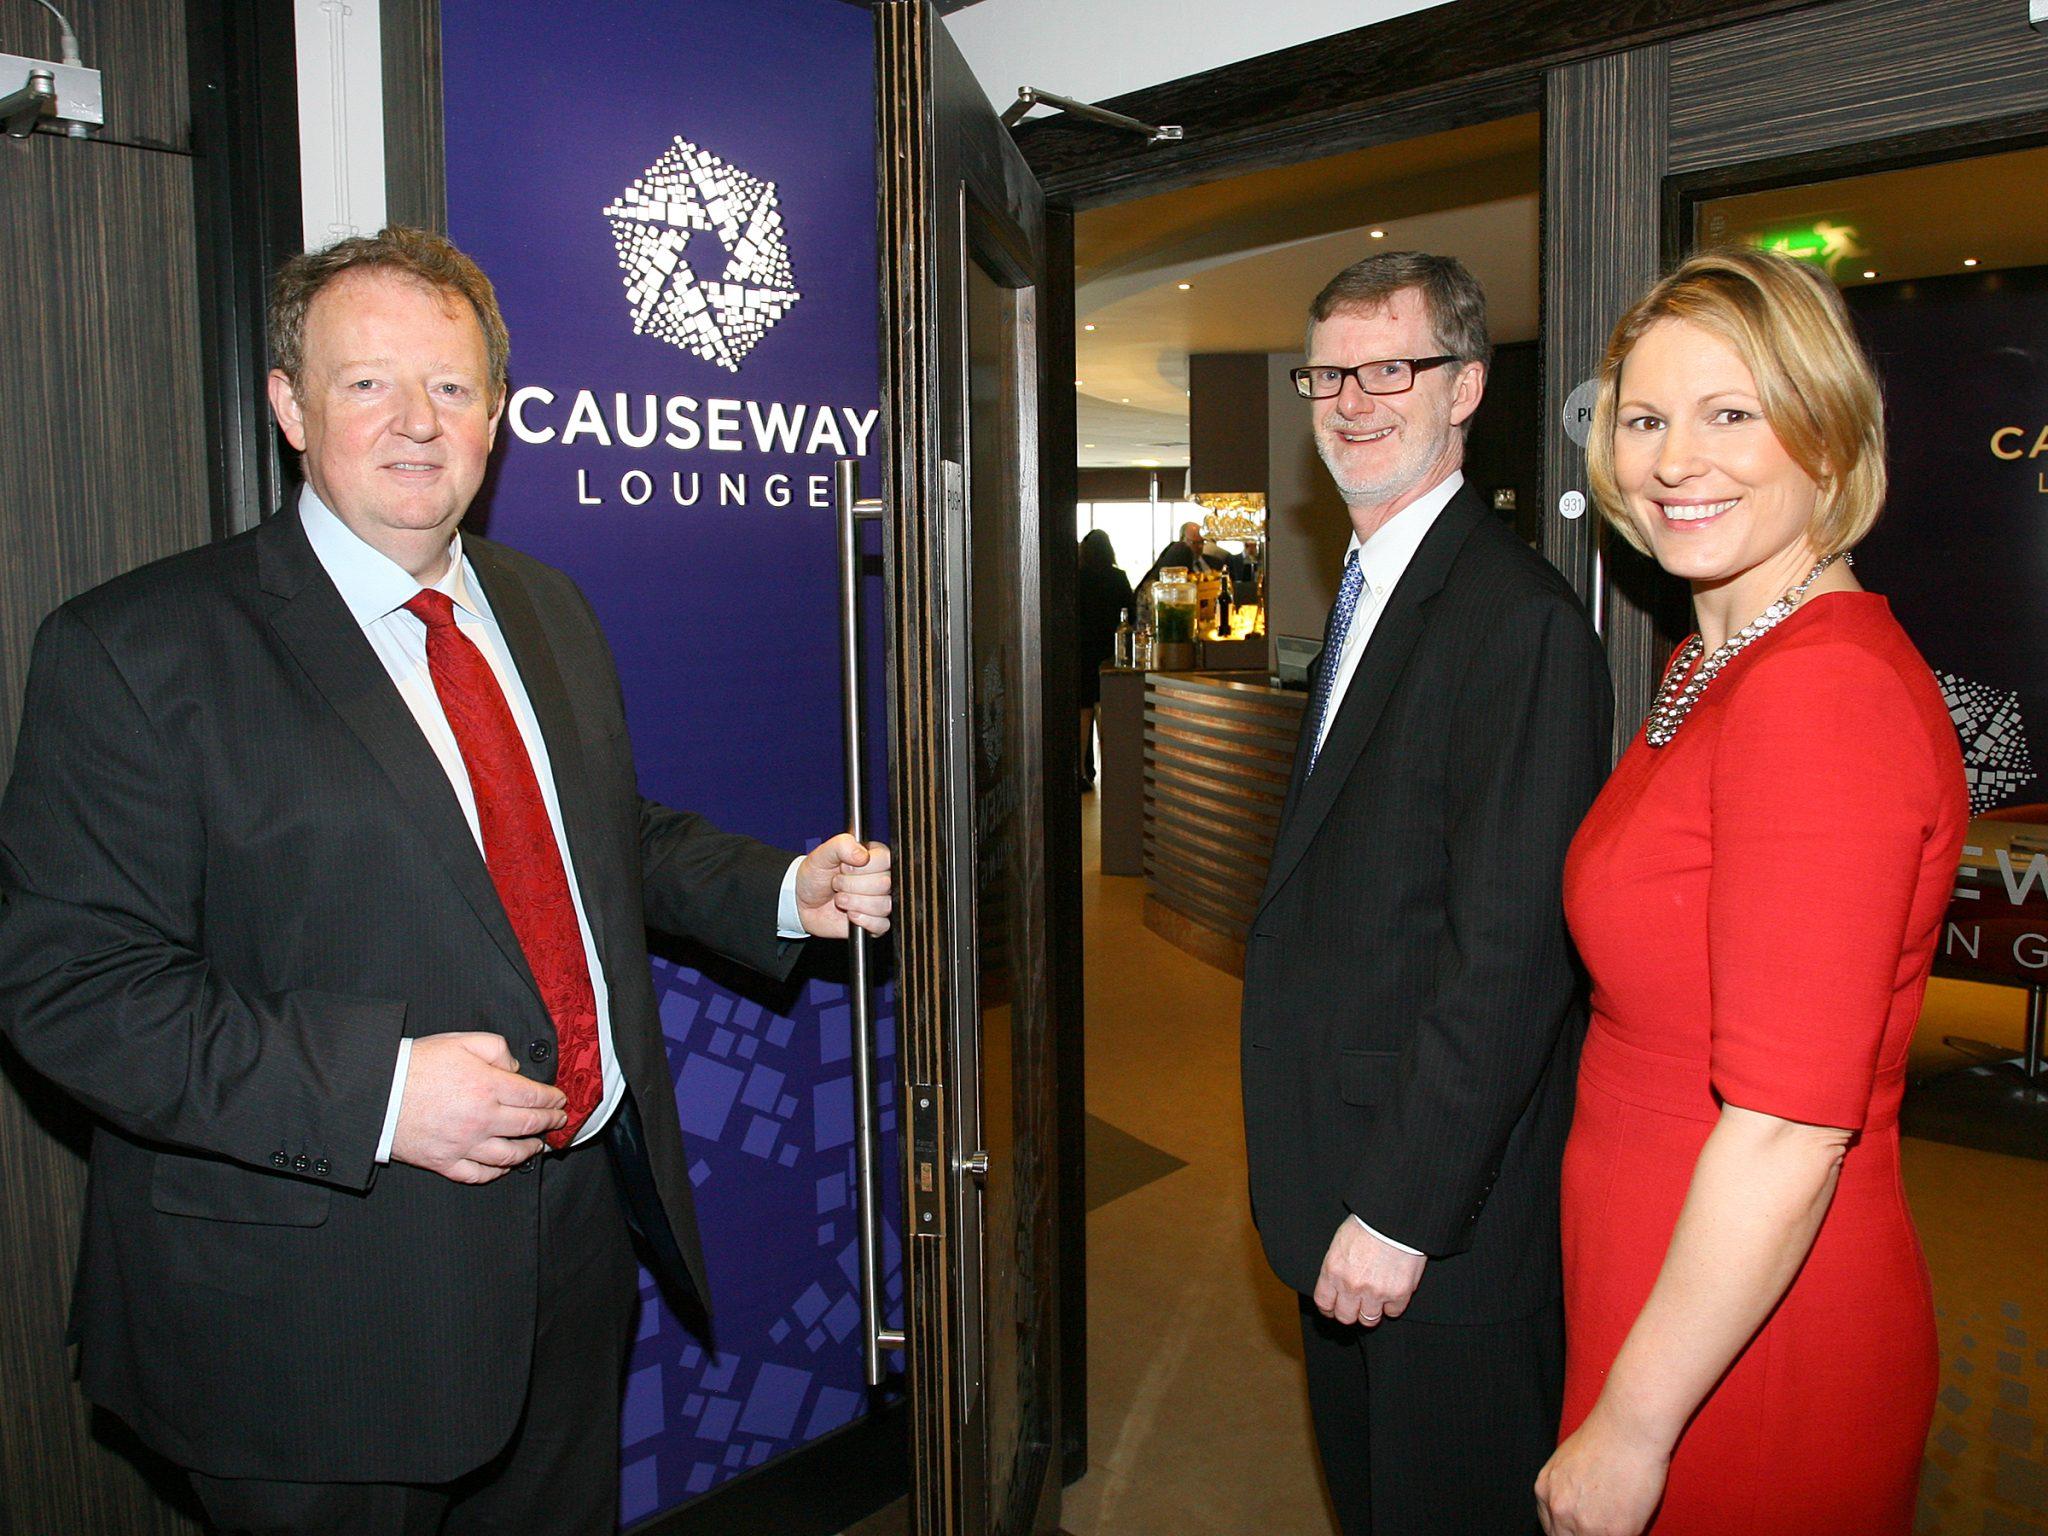 New Causeway Lounge for Belfast International  Airport